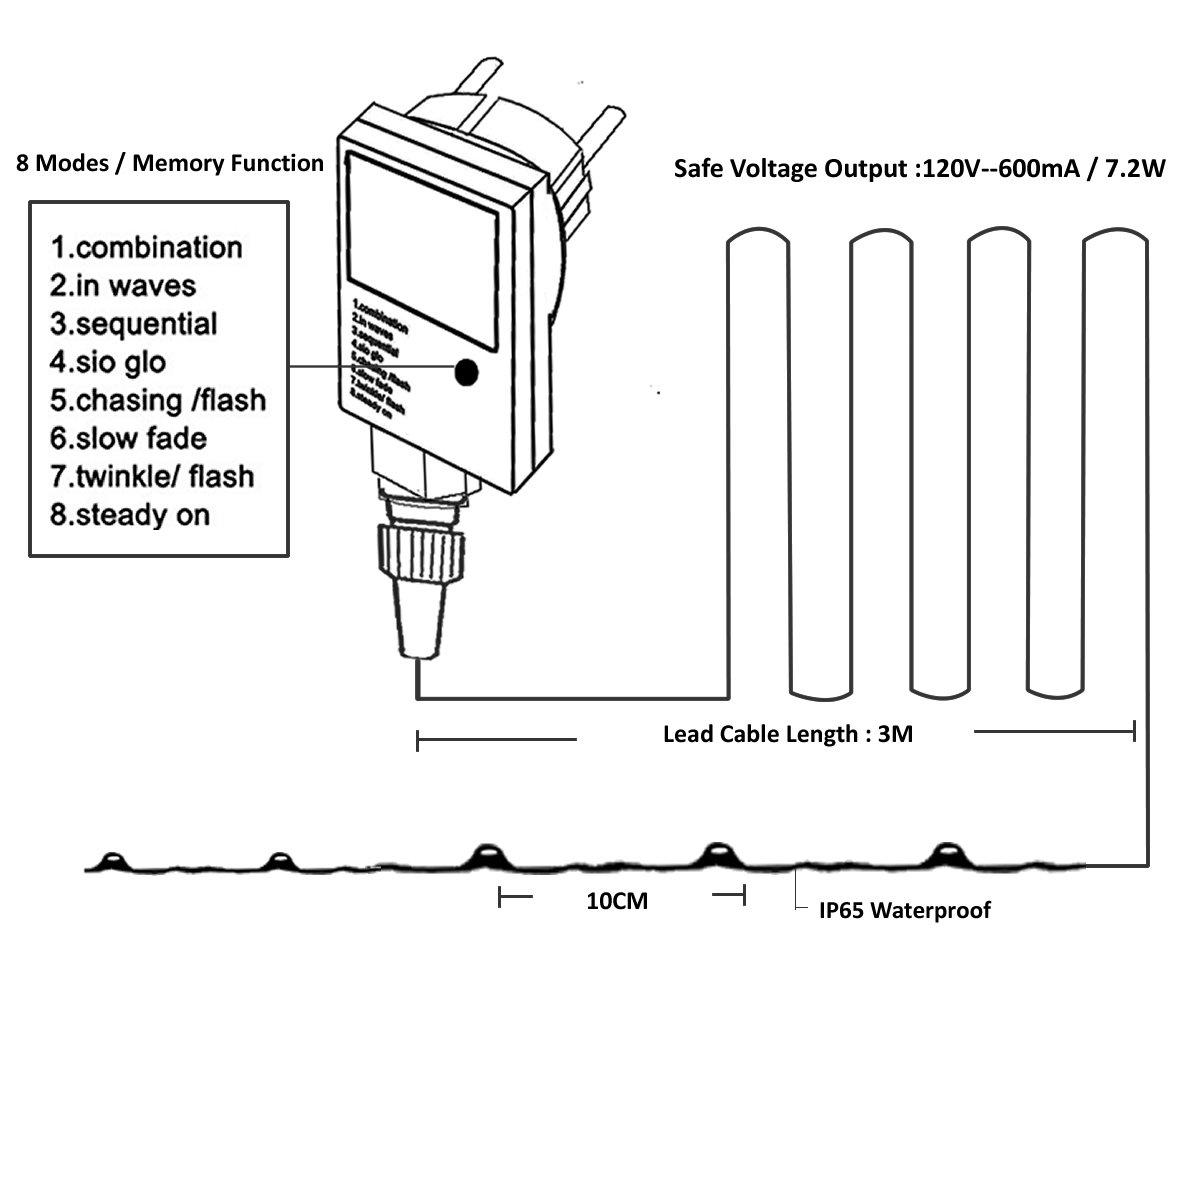 Rpgt 200 Led String Light 20m Silver Copper Wire Fairy Starry Lights Ledchristmaslightingusingtransistors 8 Modes With Safe